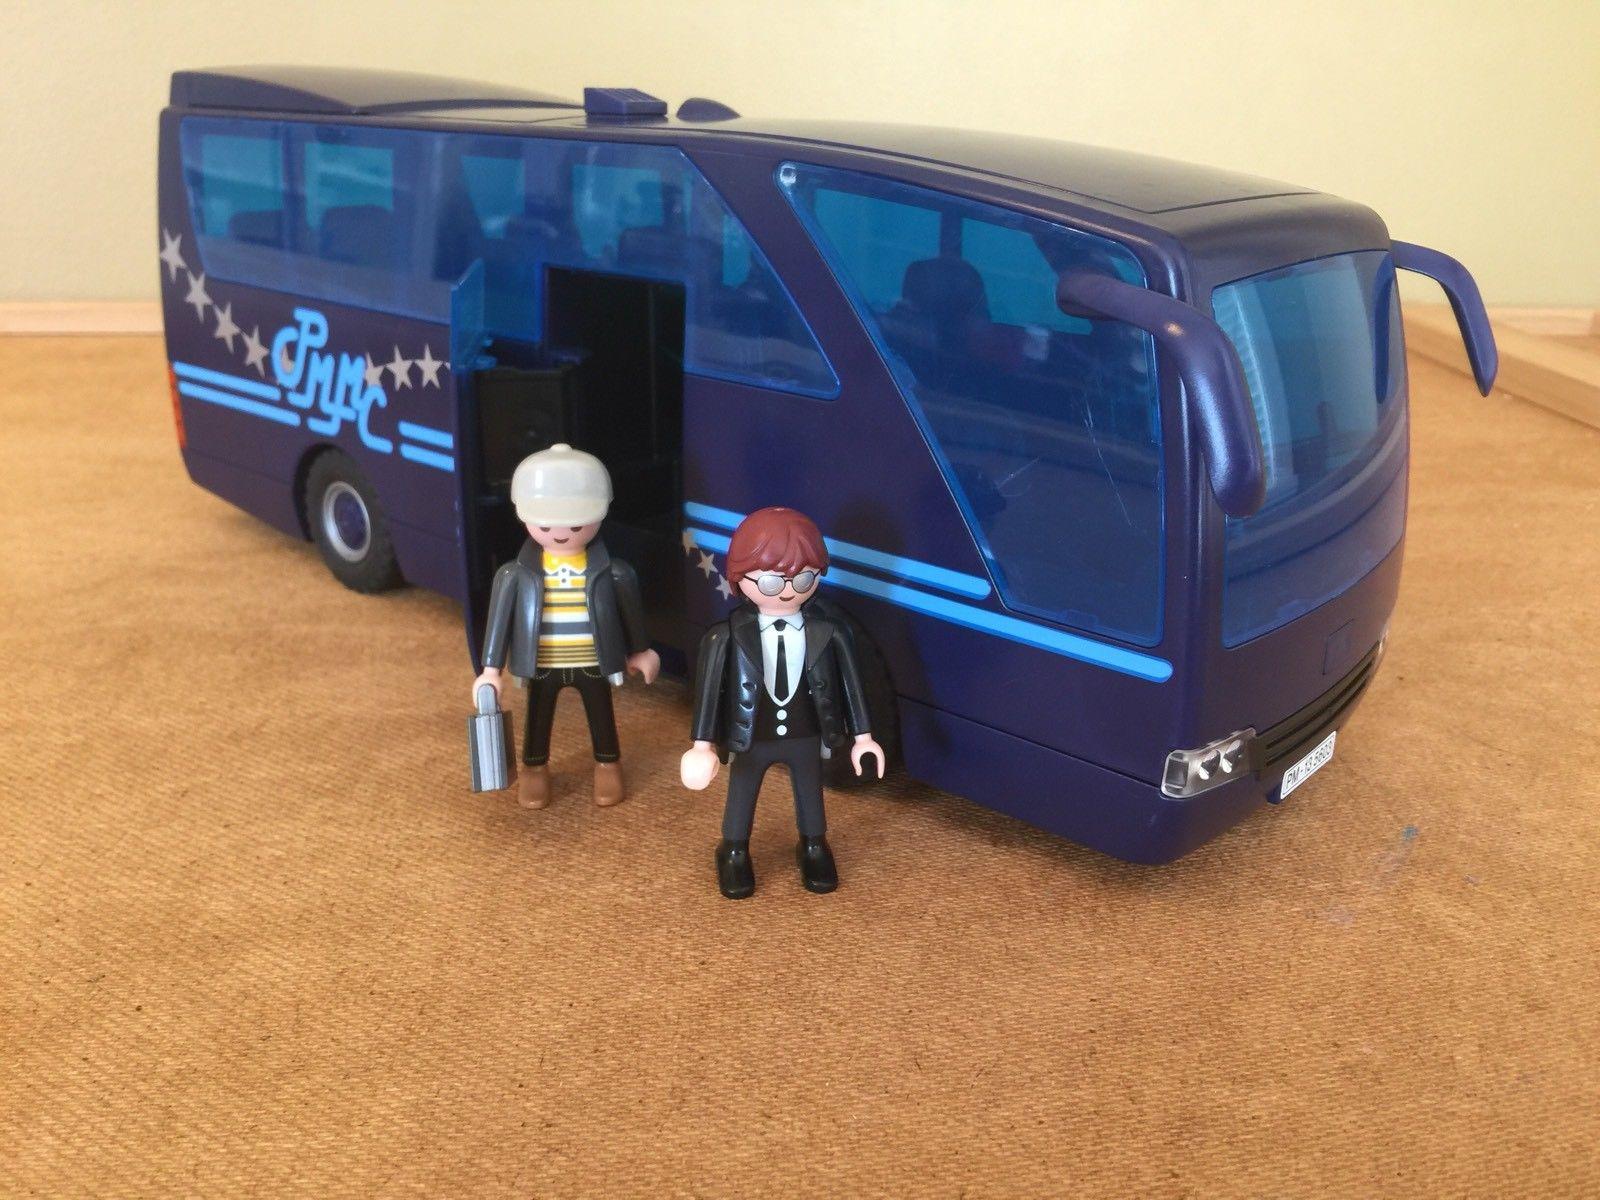 5106 Bus 5106 Bus Playmobil Bus Bus Prix Prix Playmobil 5106 Playmobil 5106 Playmobil Prix L5A34Rj